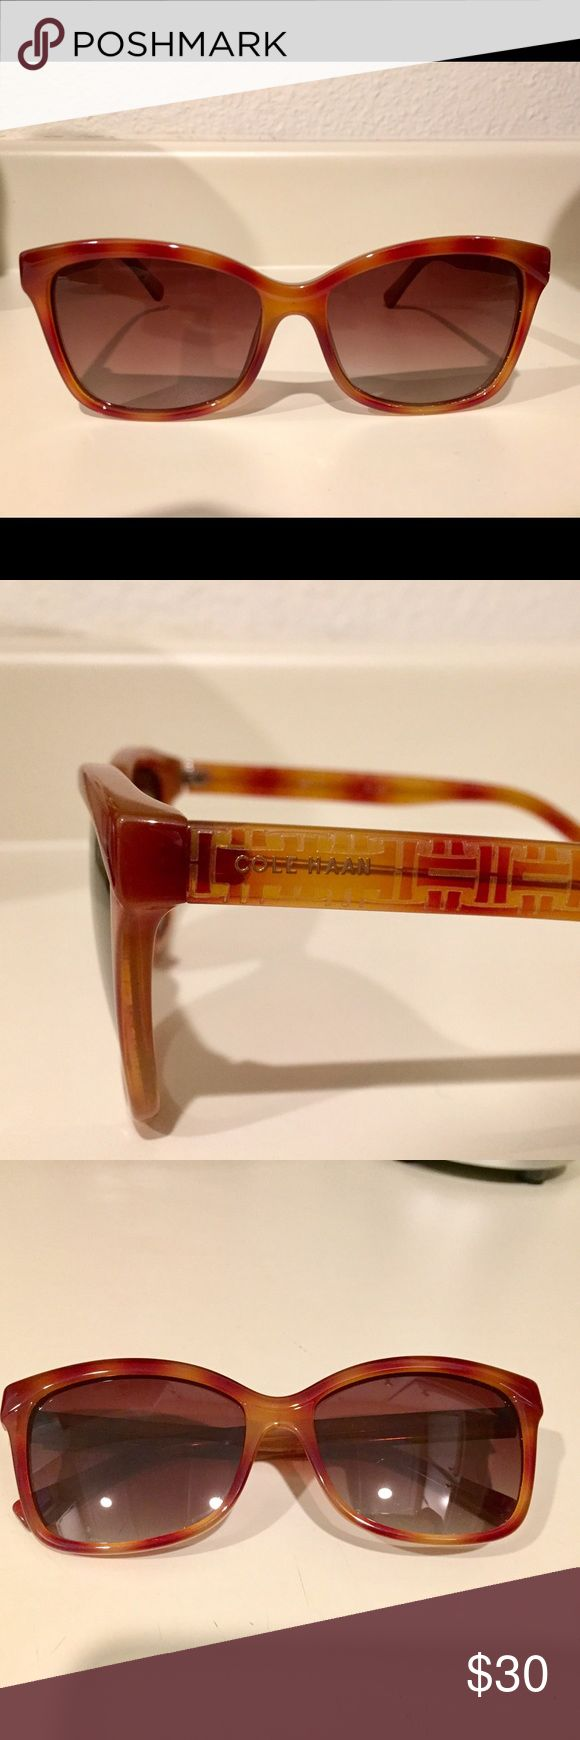 Cole Haan Women's Sunglasses Style: Cole Haan Women's Brown Tortoiseshell-Look & Yellow C17072 Wayfarer Sunglasses. Very comfortable. Worn lightly for 1 month. Cole Haan Accessories Sunglasses